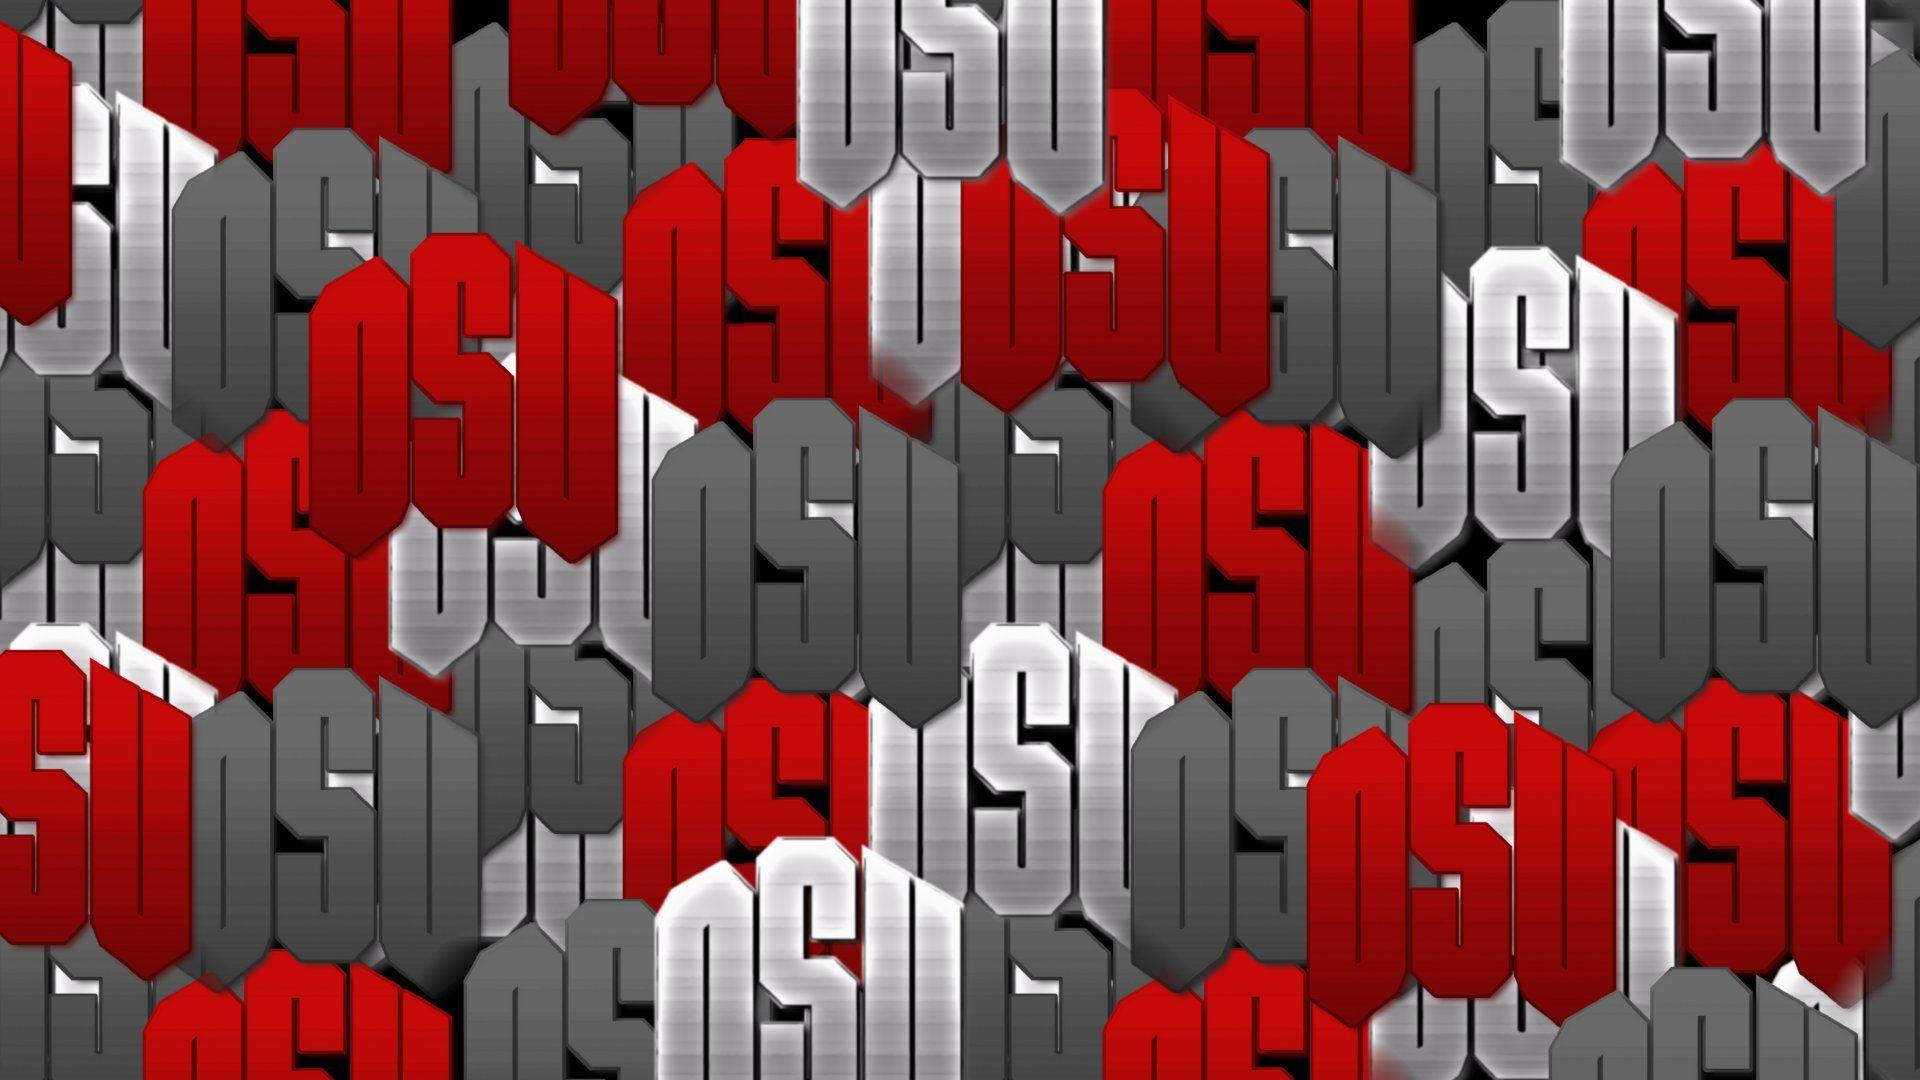 Ohio State Football Wallpaper Osu Wallpaper 427 Ohio State Football Ohio State Football Wallpaper Ohio State Vs Michigan